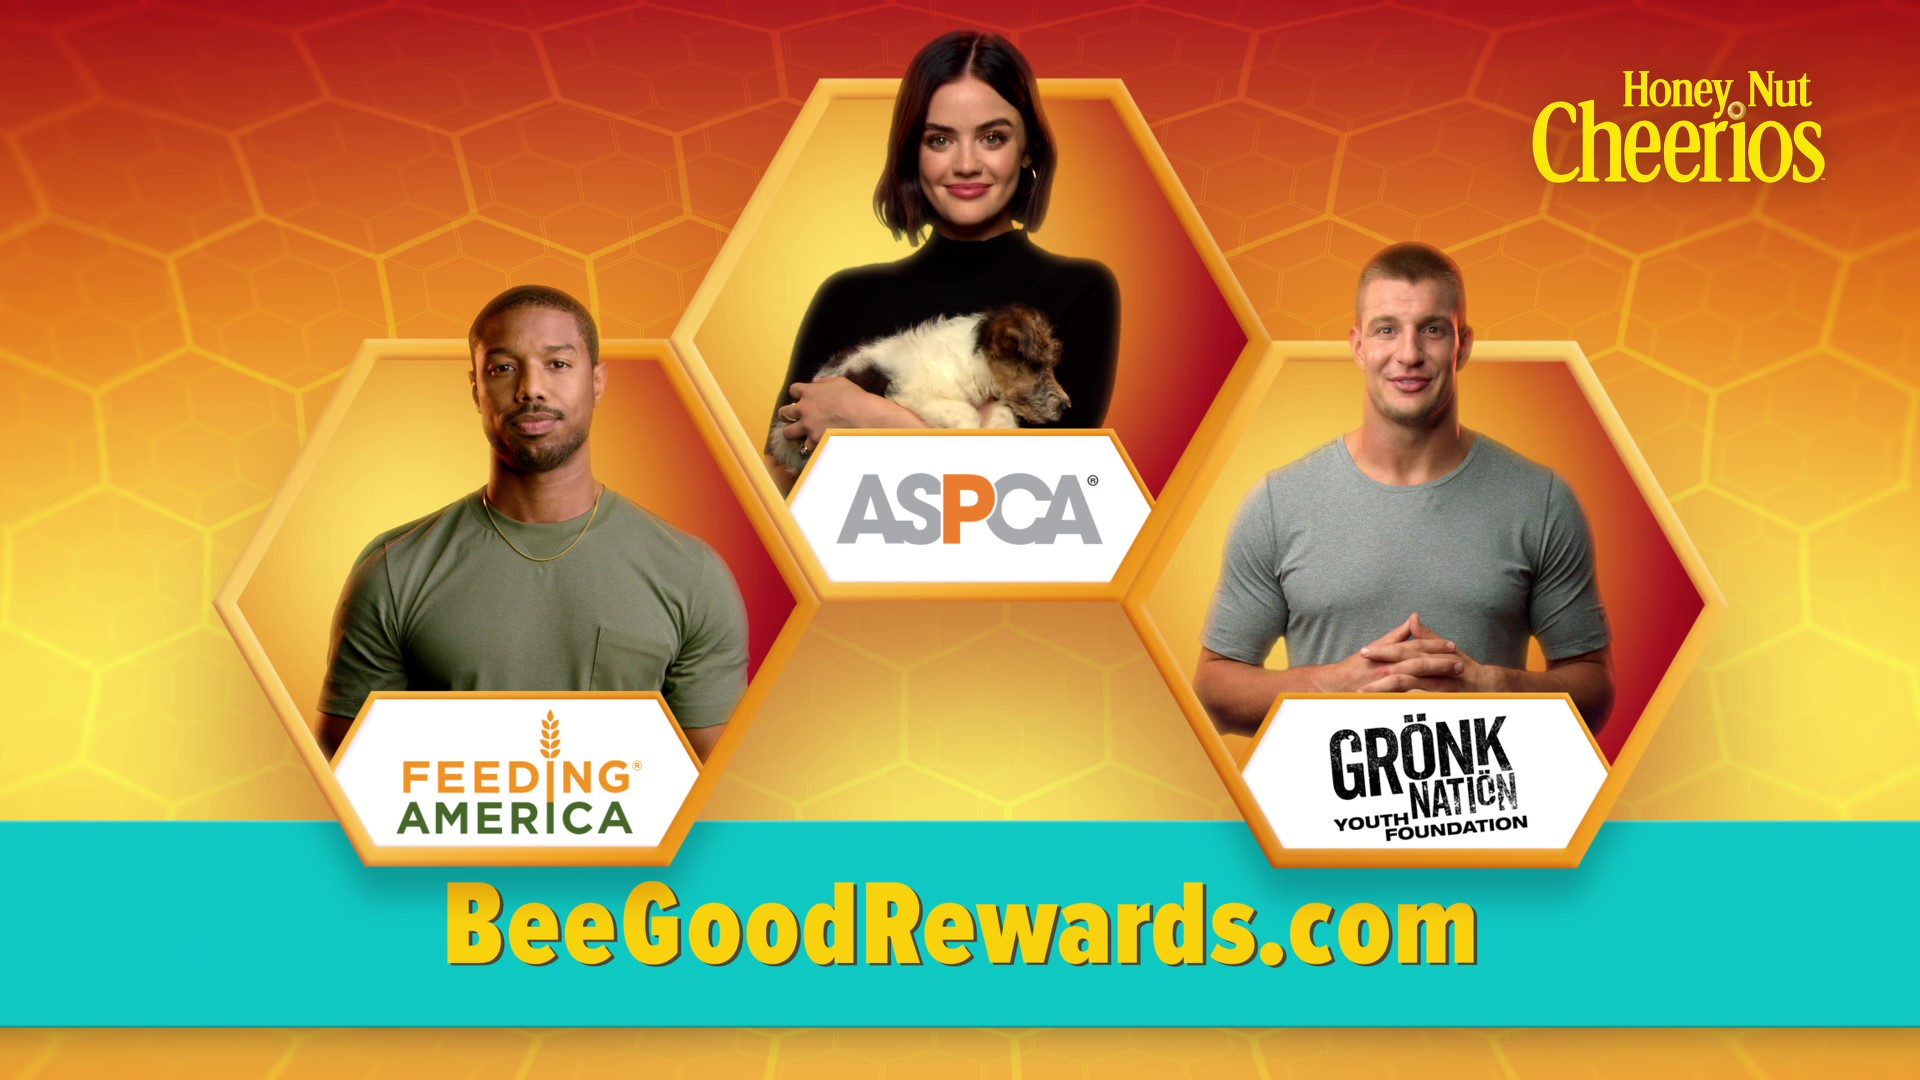 Honey Nut Cheerios™ Good Rewards Program